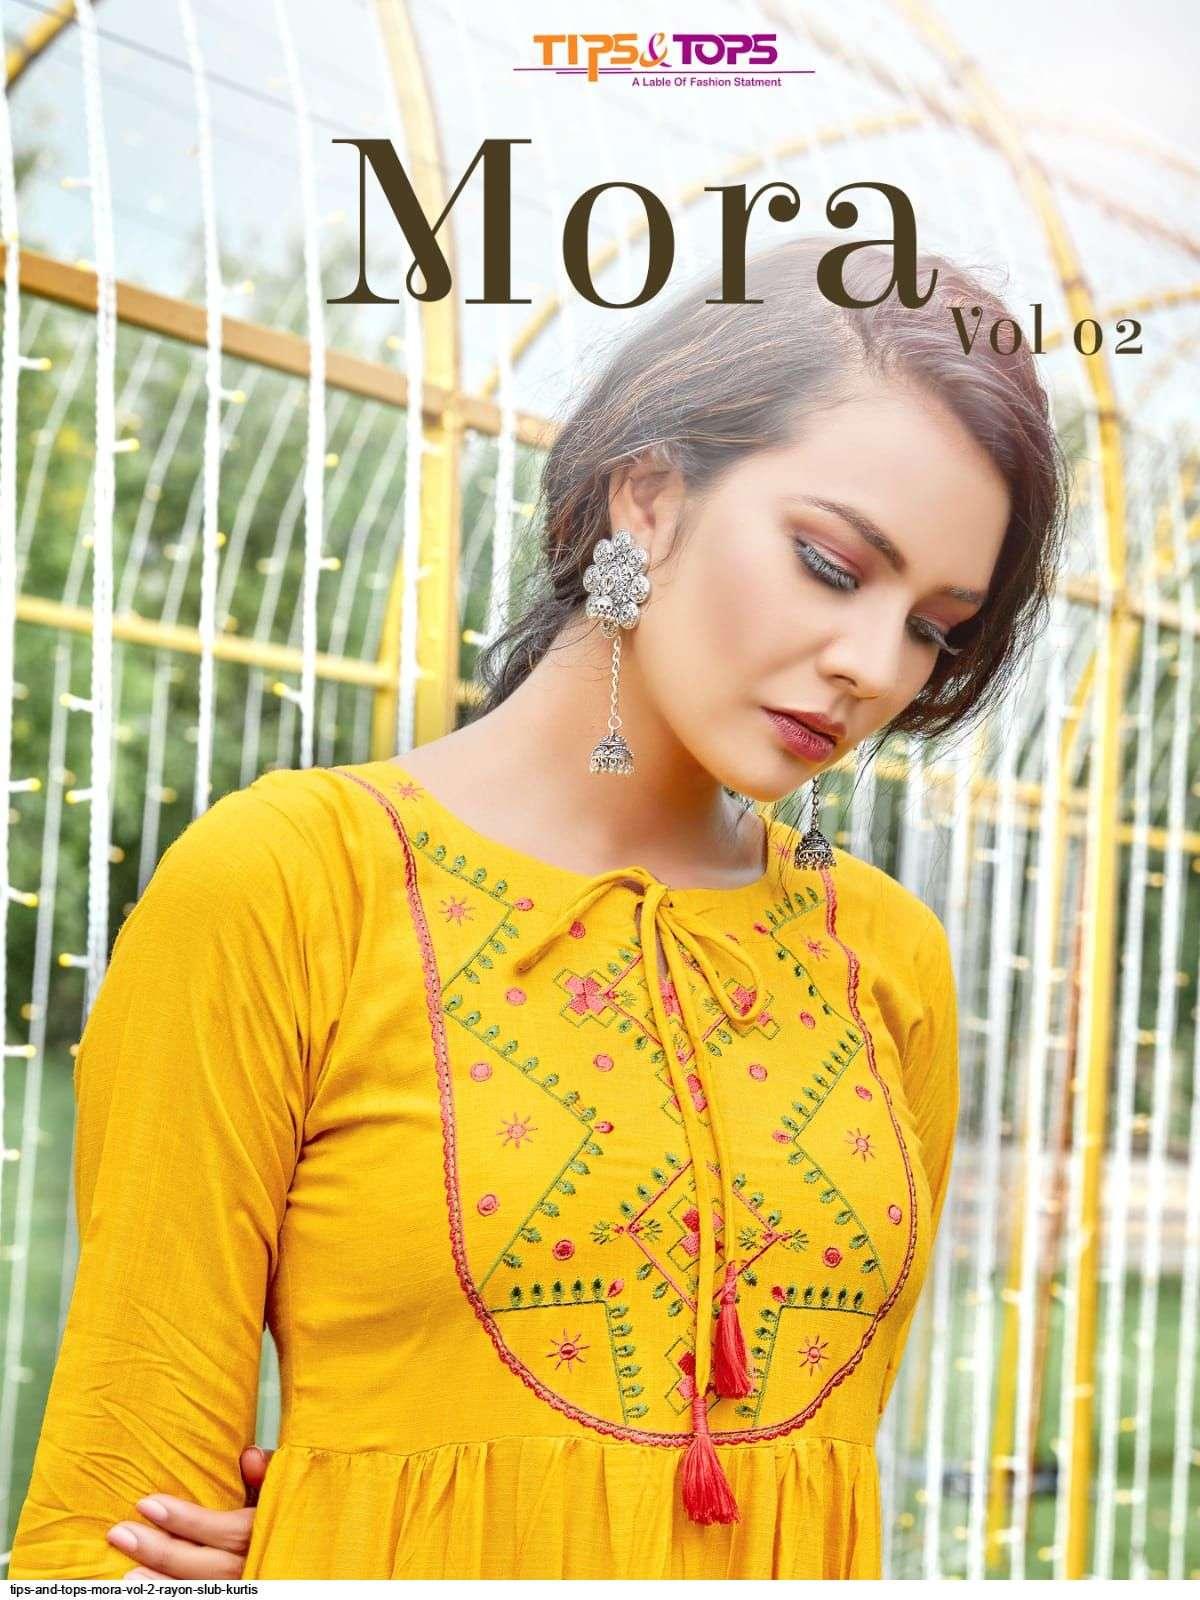 tips and tops mora vol 2 series 01-06 Heavy Reyon Slub kurtis